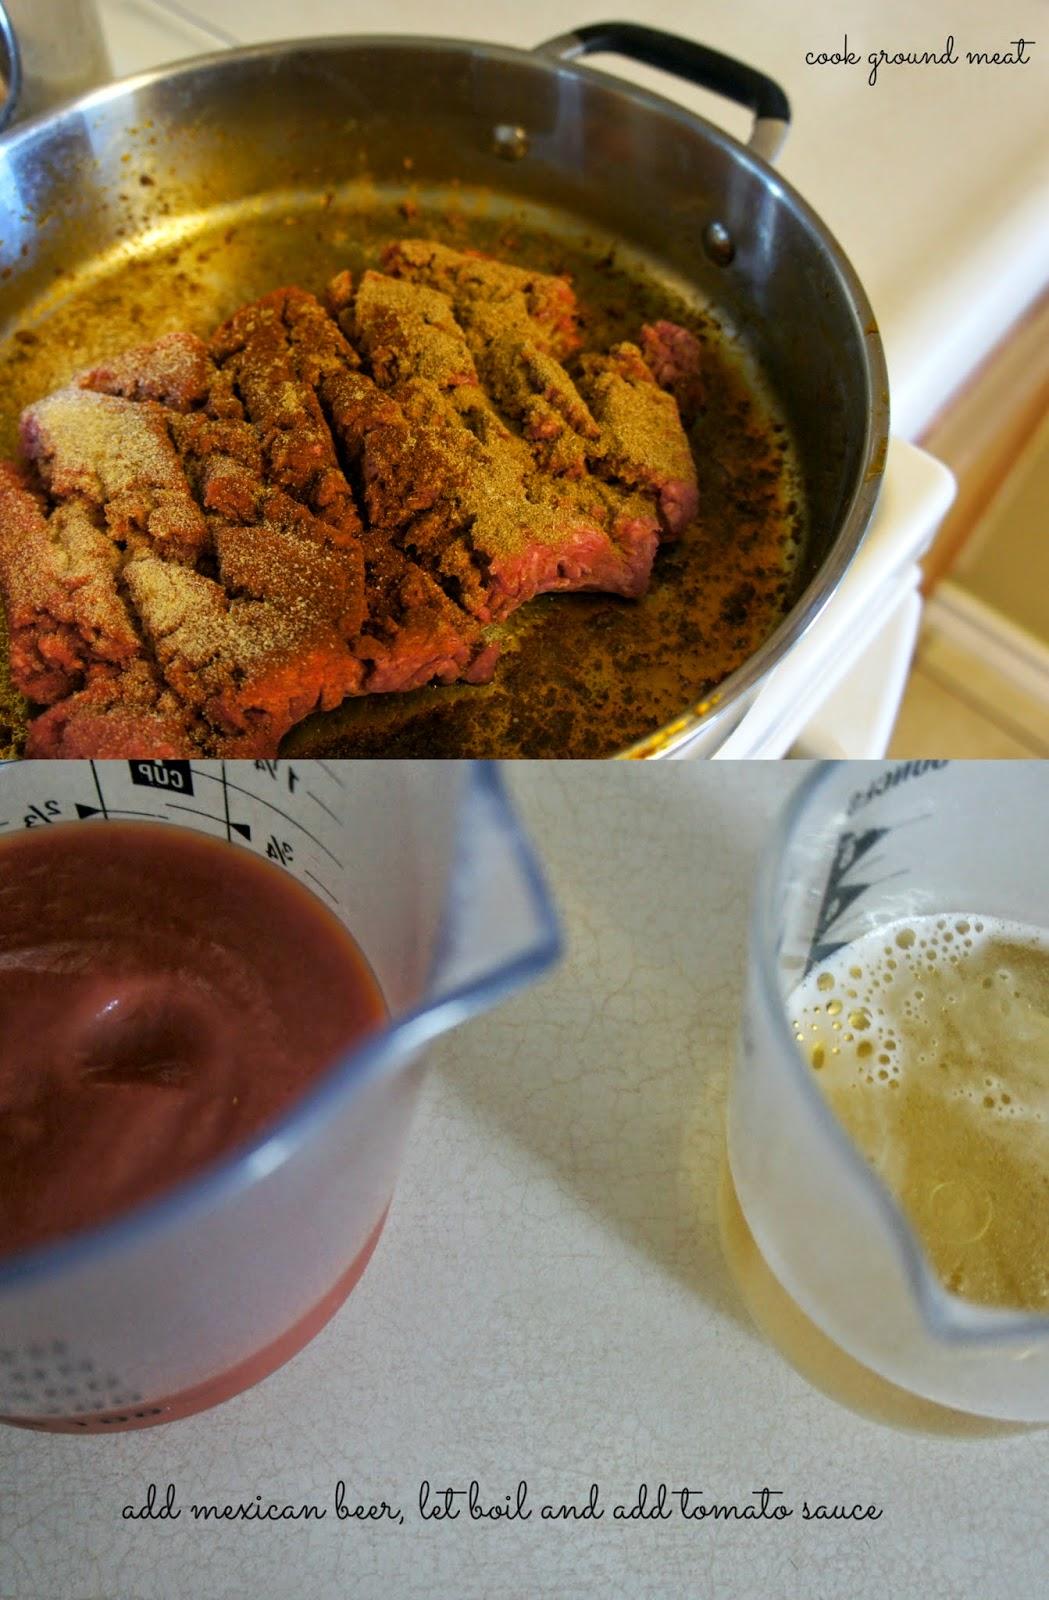 Steps to make #BarillaFiesta Mexican Cowboy Spaghetti